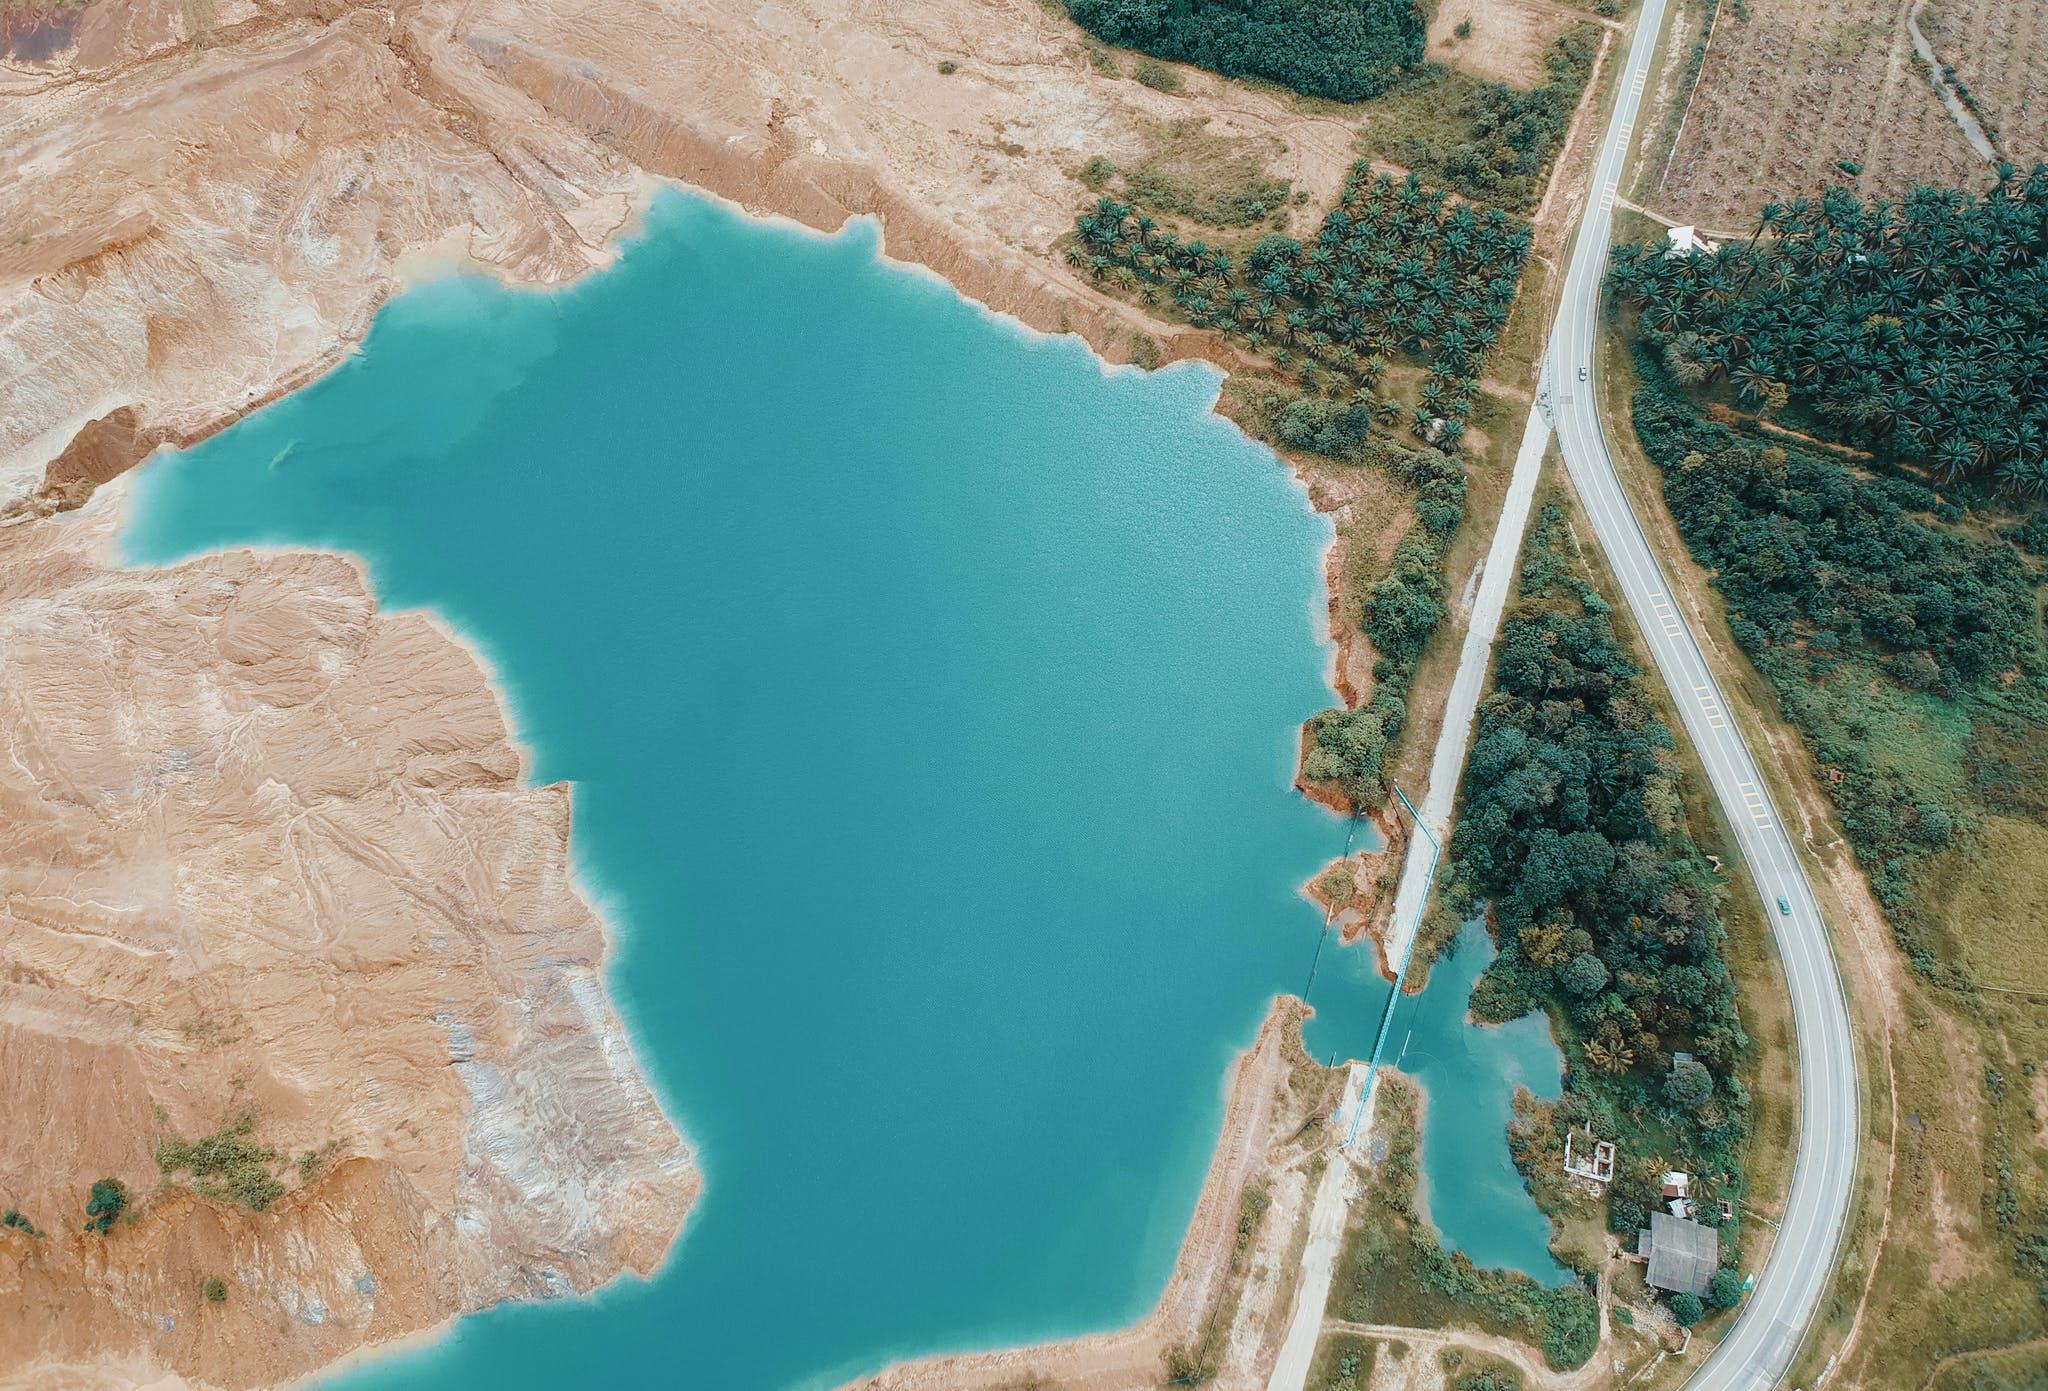 Aerial Photo of Lake Near Highway